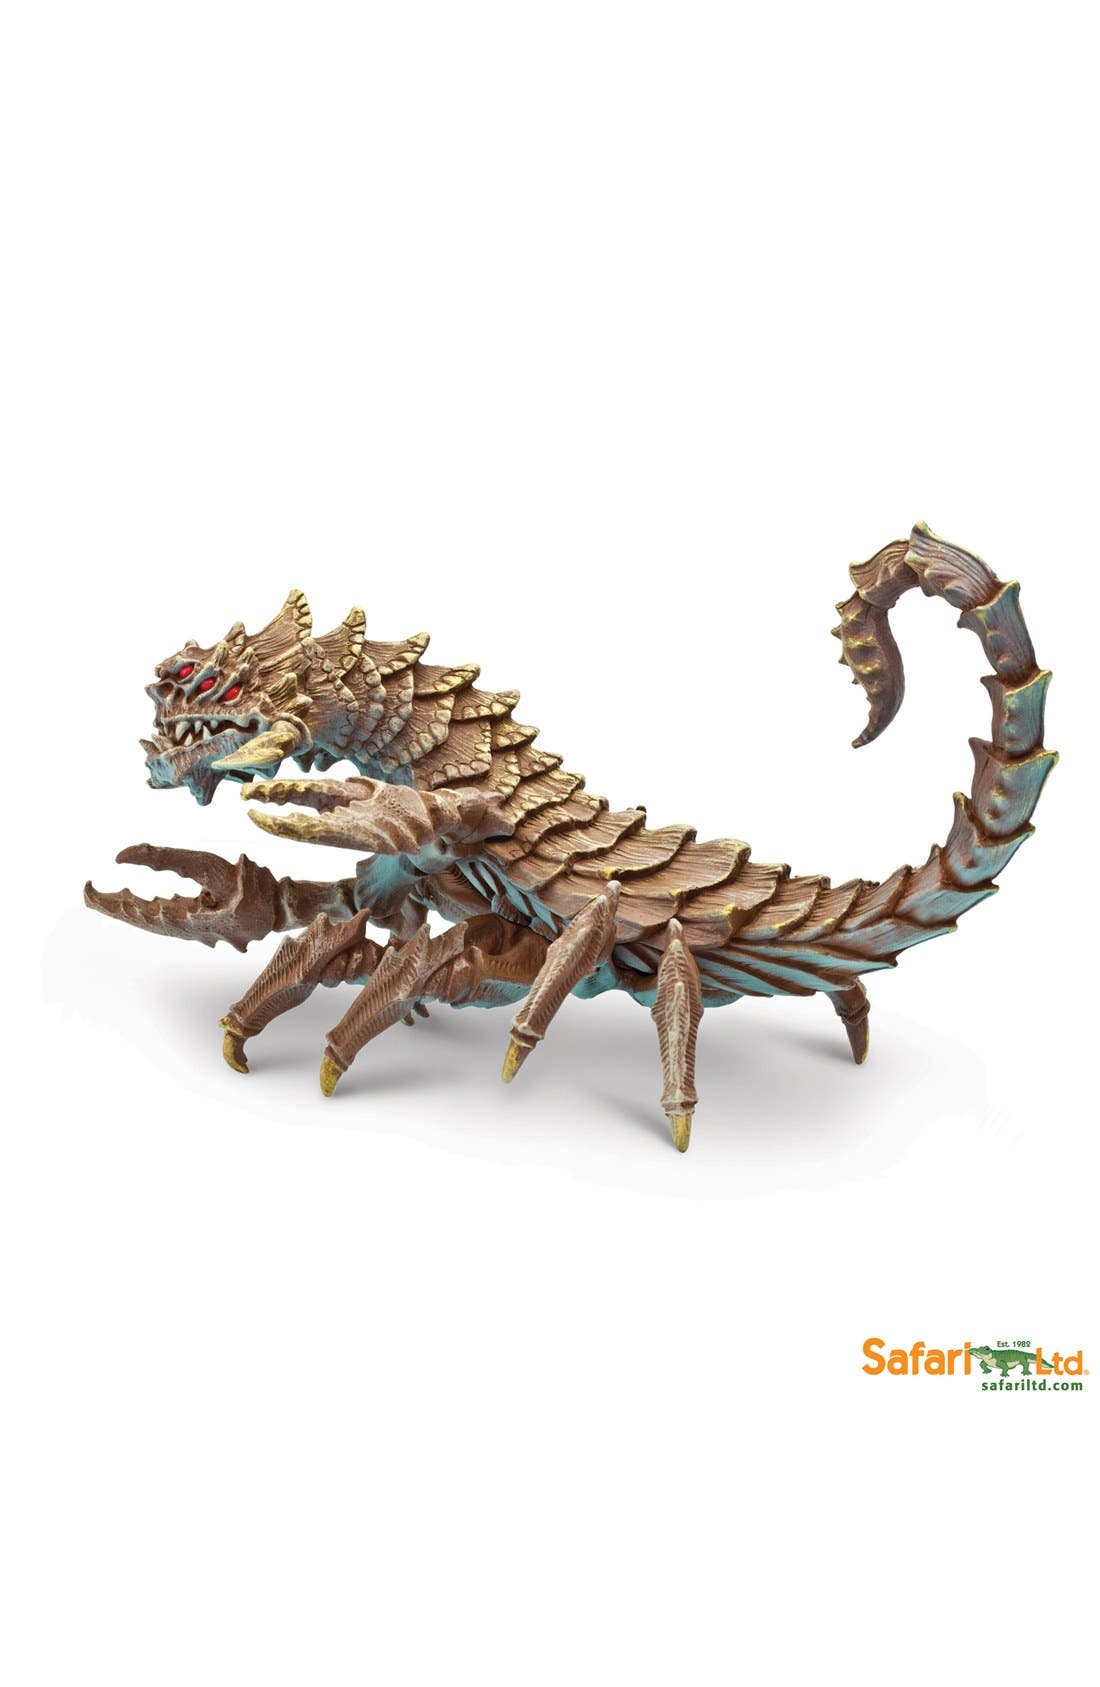 Main Image - Safari Ltd. Desert Dragon Figurine